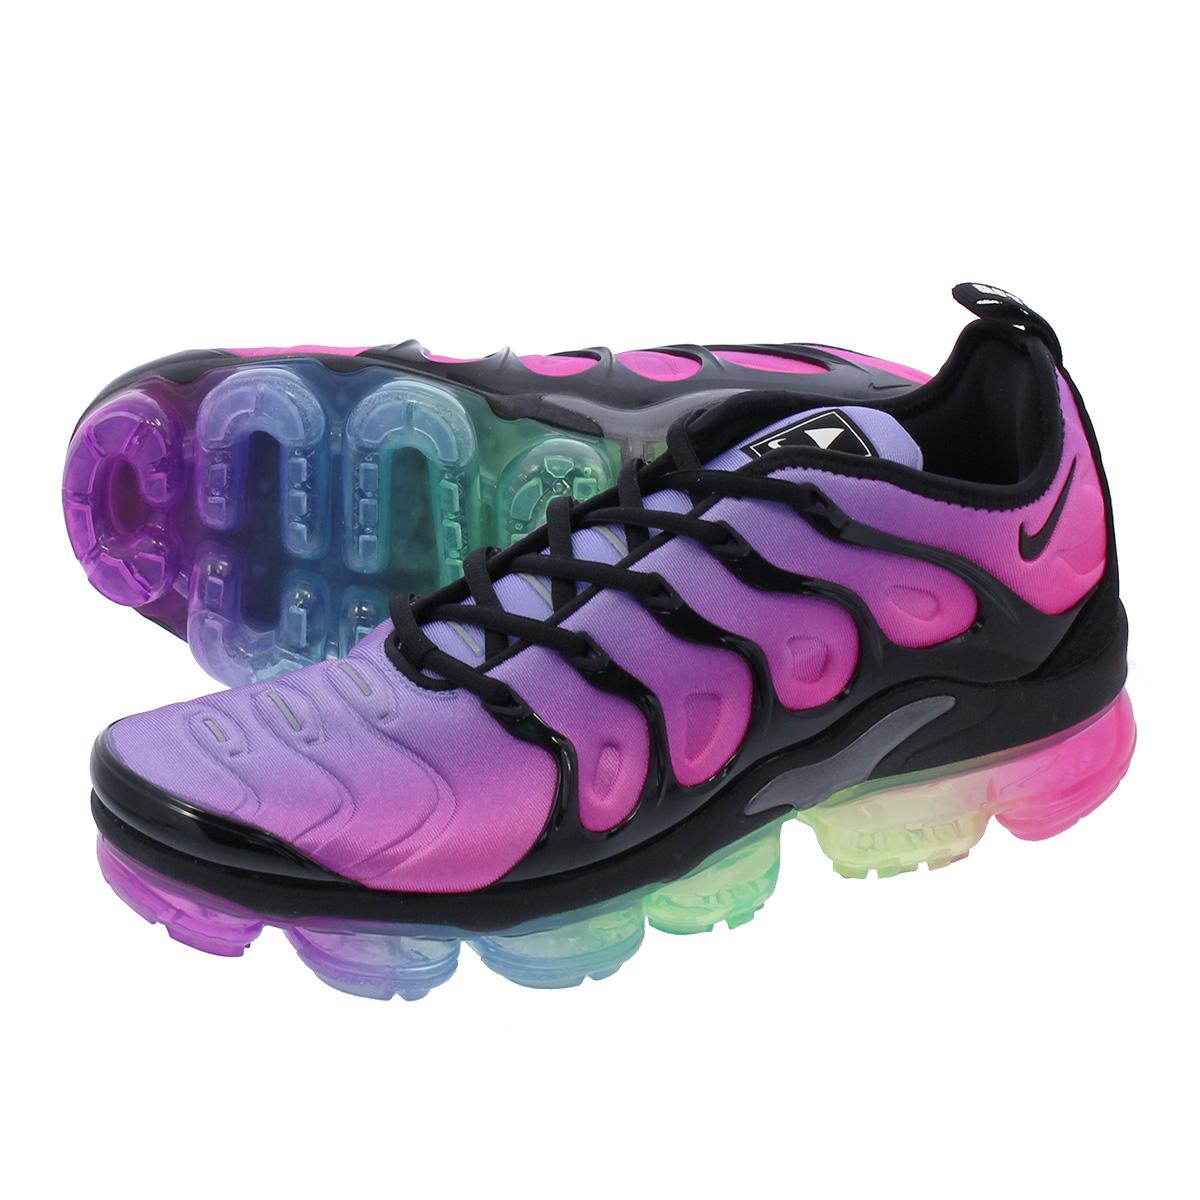 577340ede3d7 ... new arrivals nike air vapormax plus nike vapor max plus purple pulse  pink blast multi color